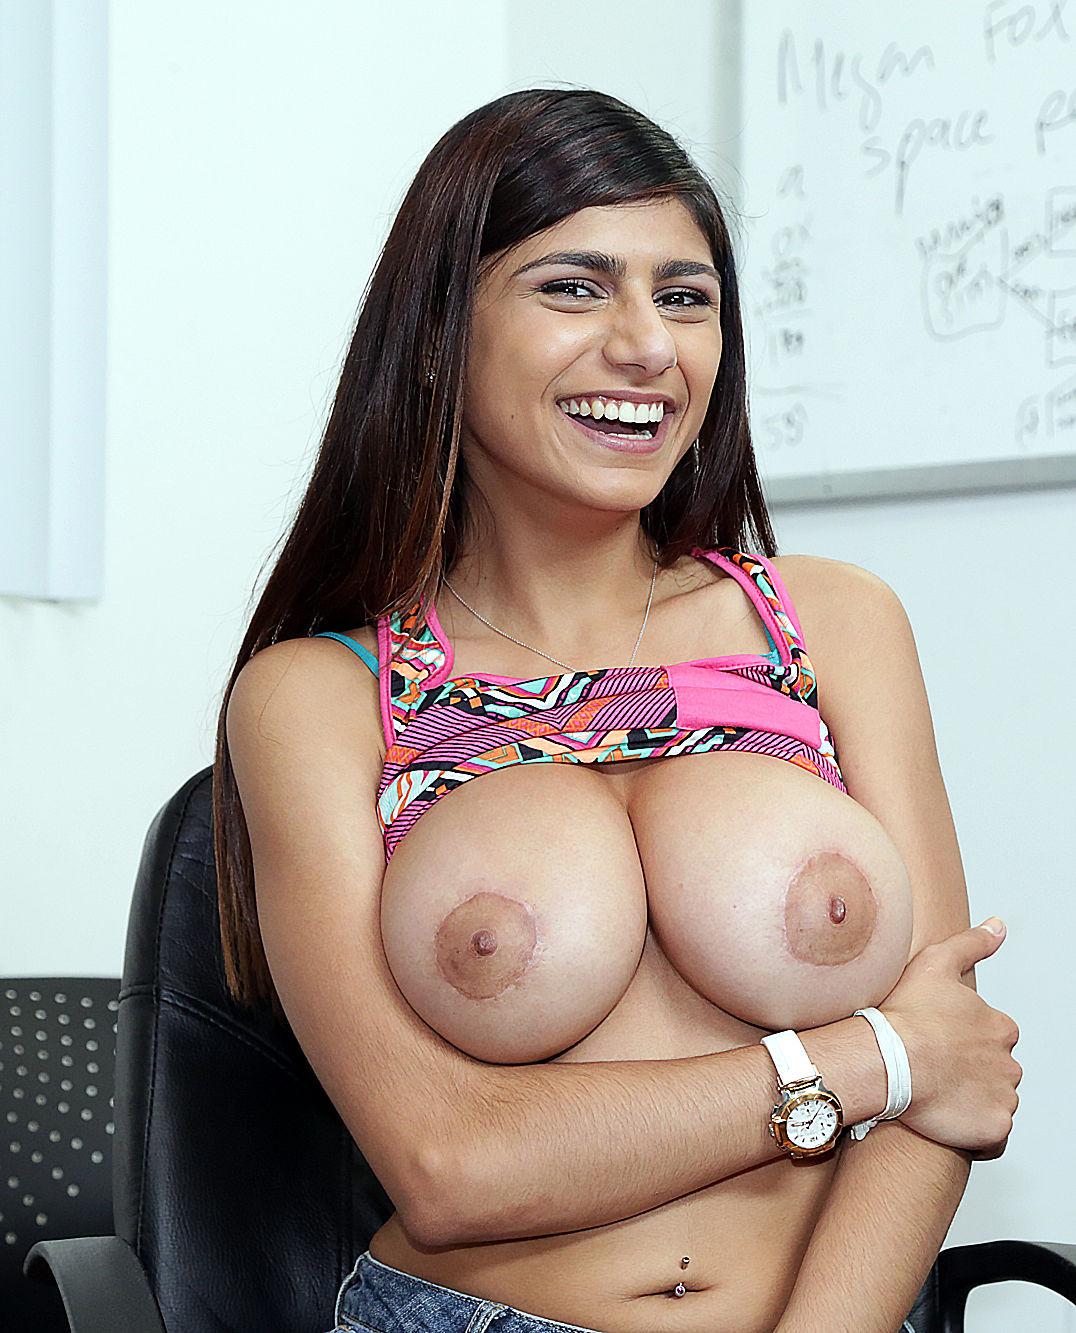 Frauen nackt araber Beste Araber